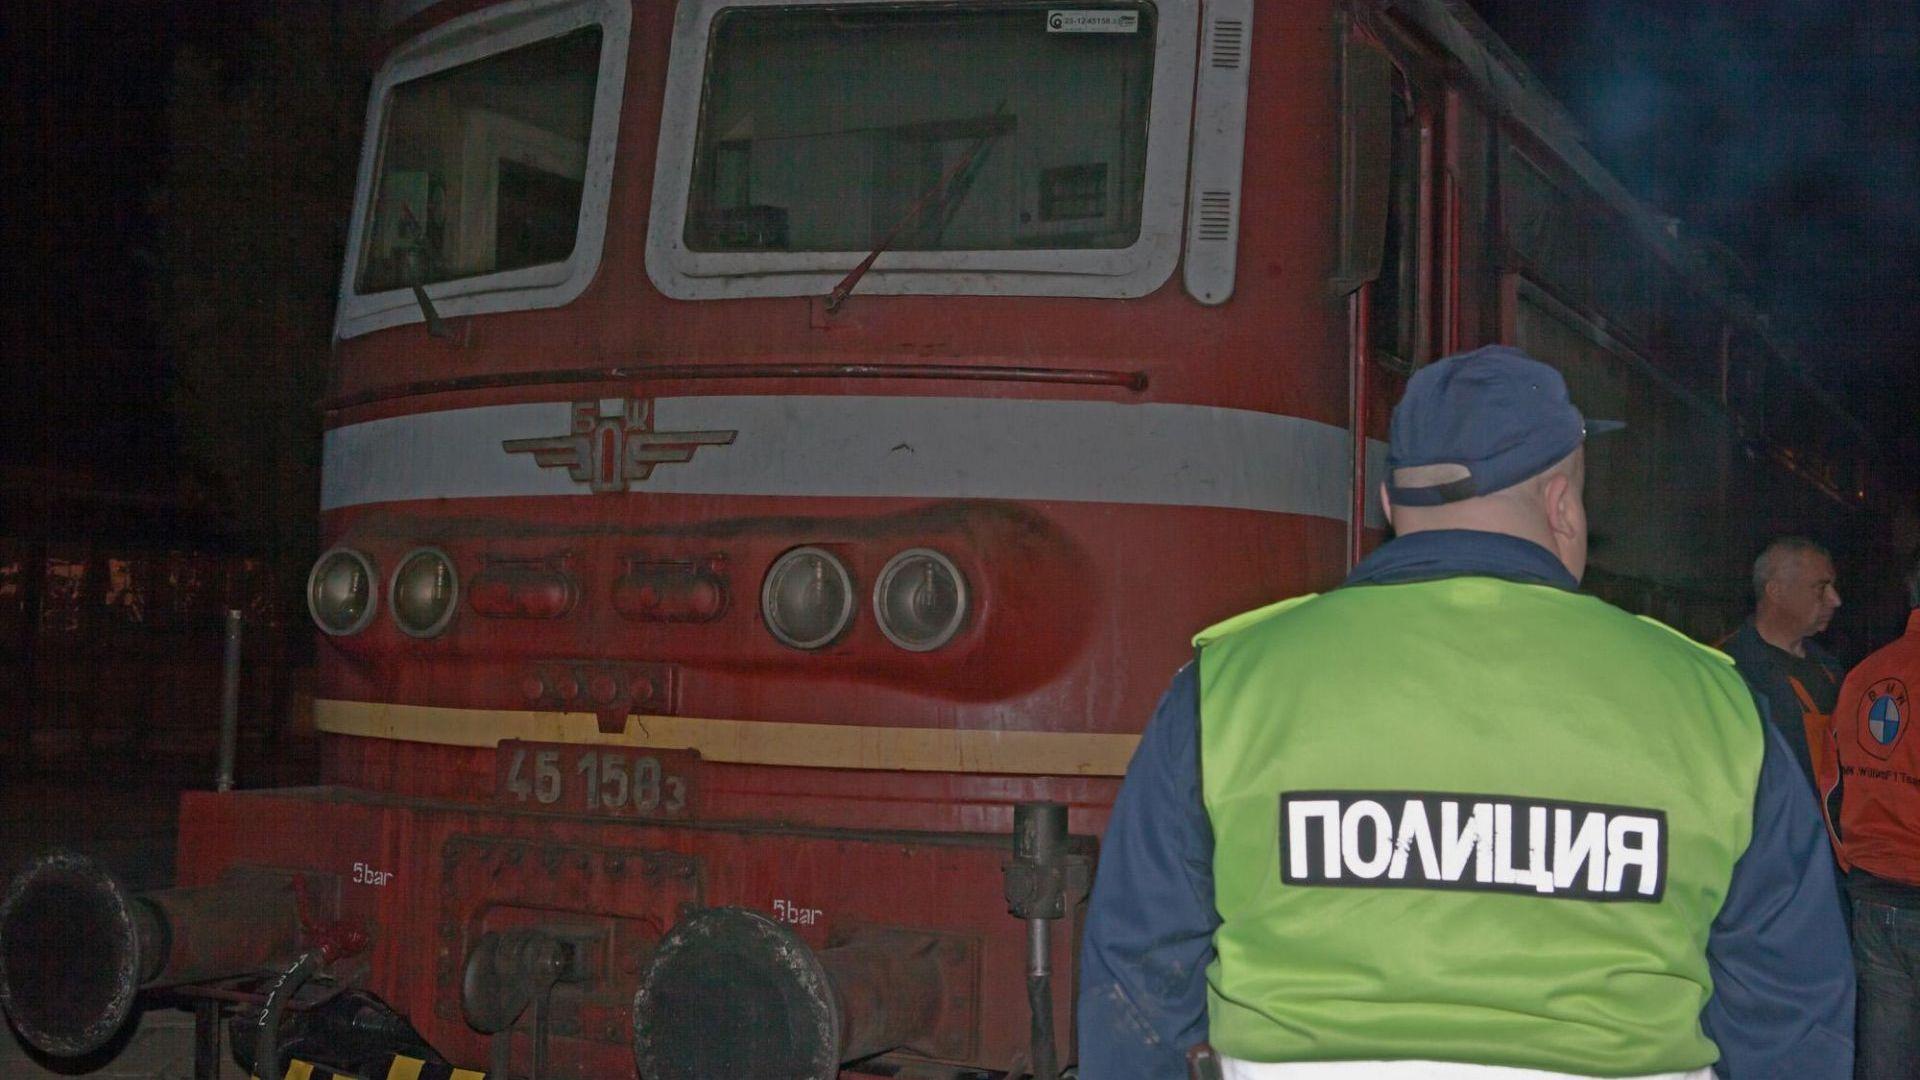 Пламна локомотивът на влака Ямбол-Бургас